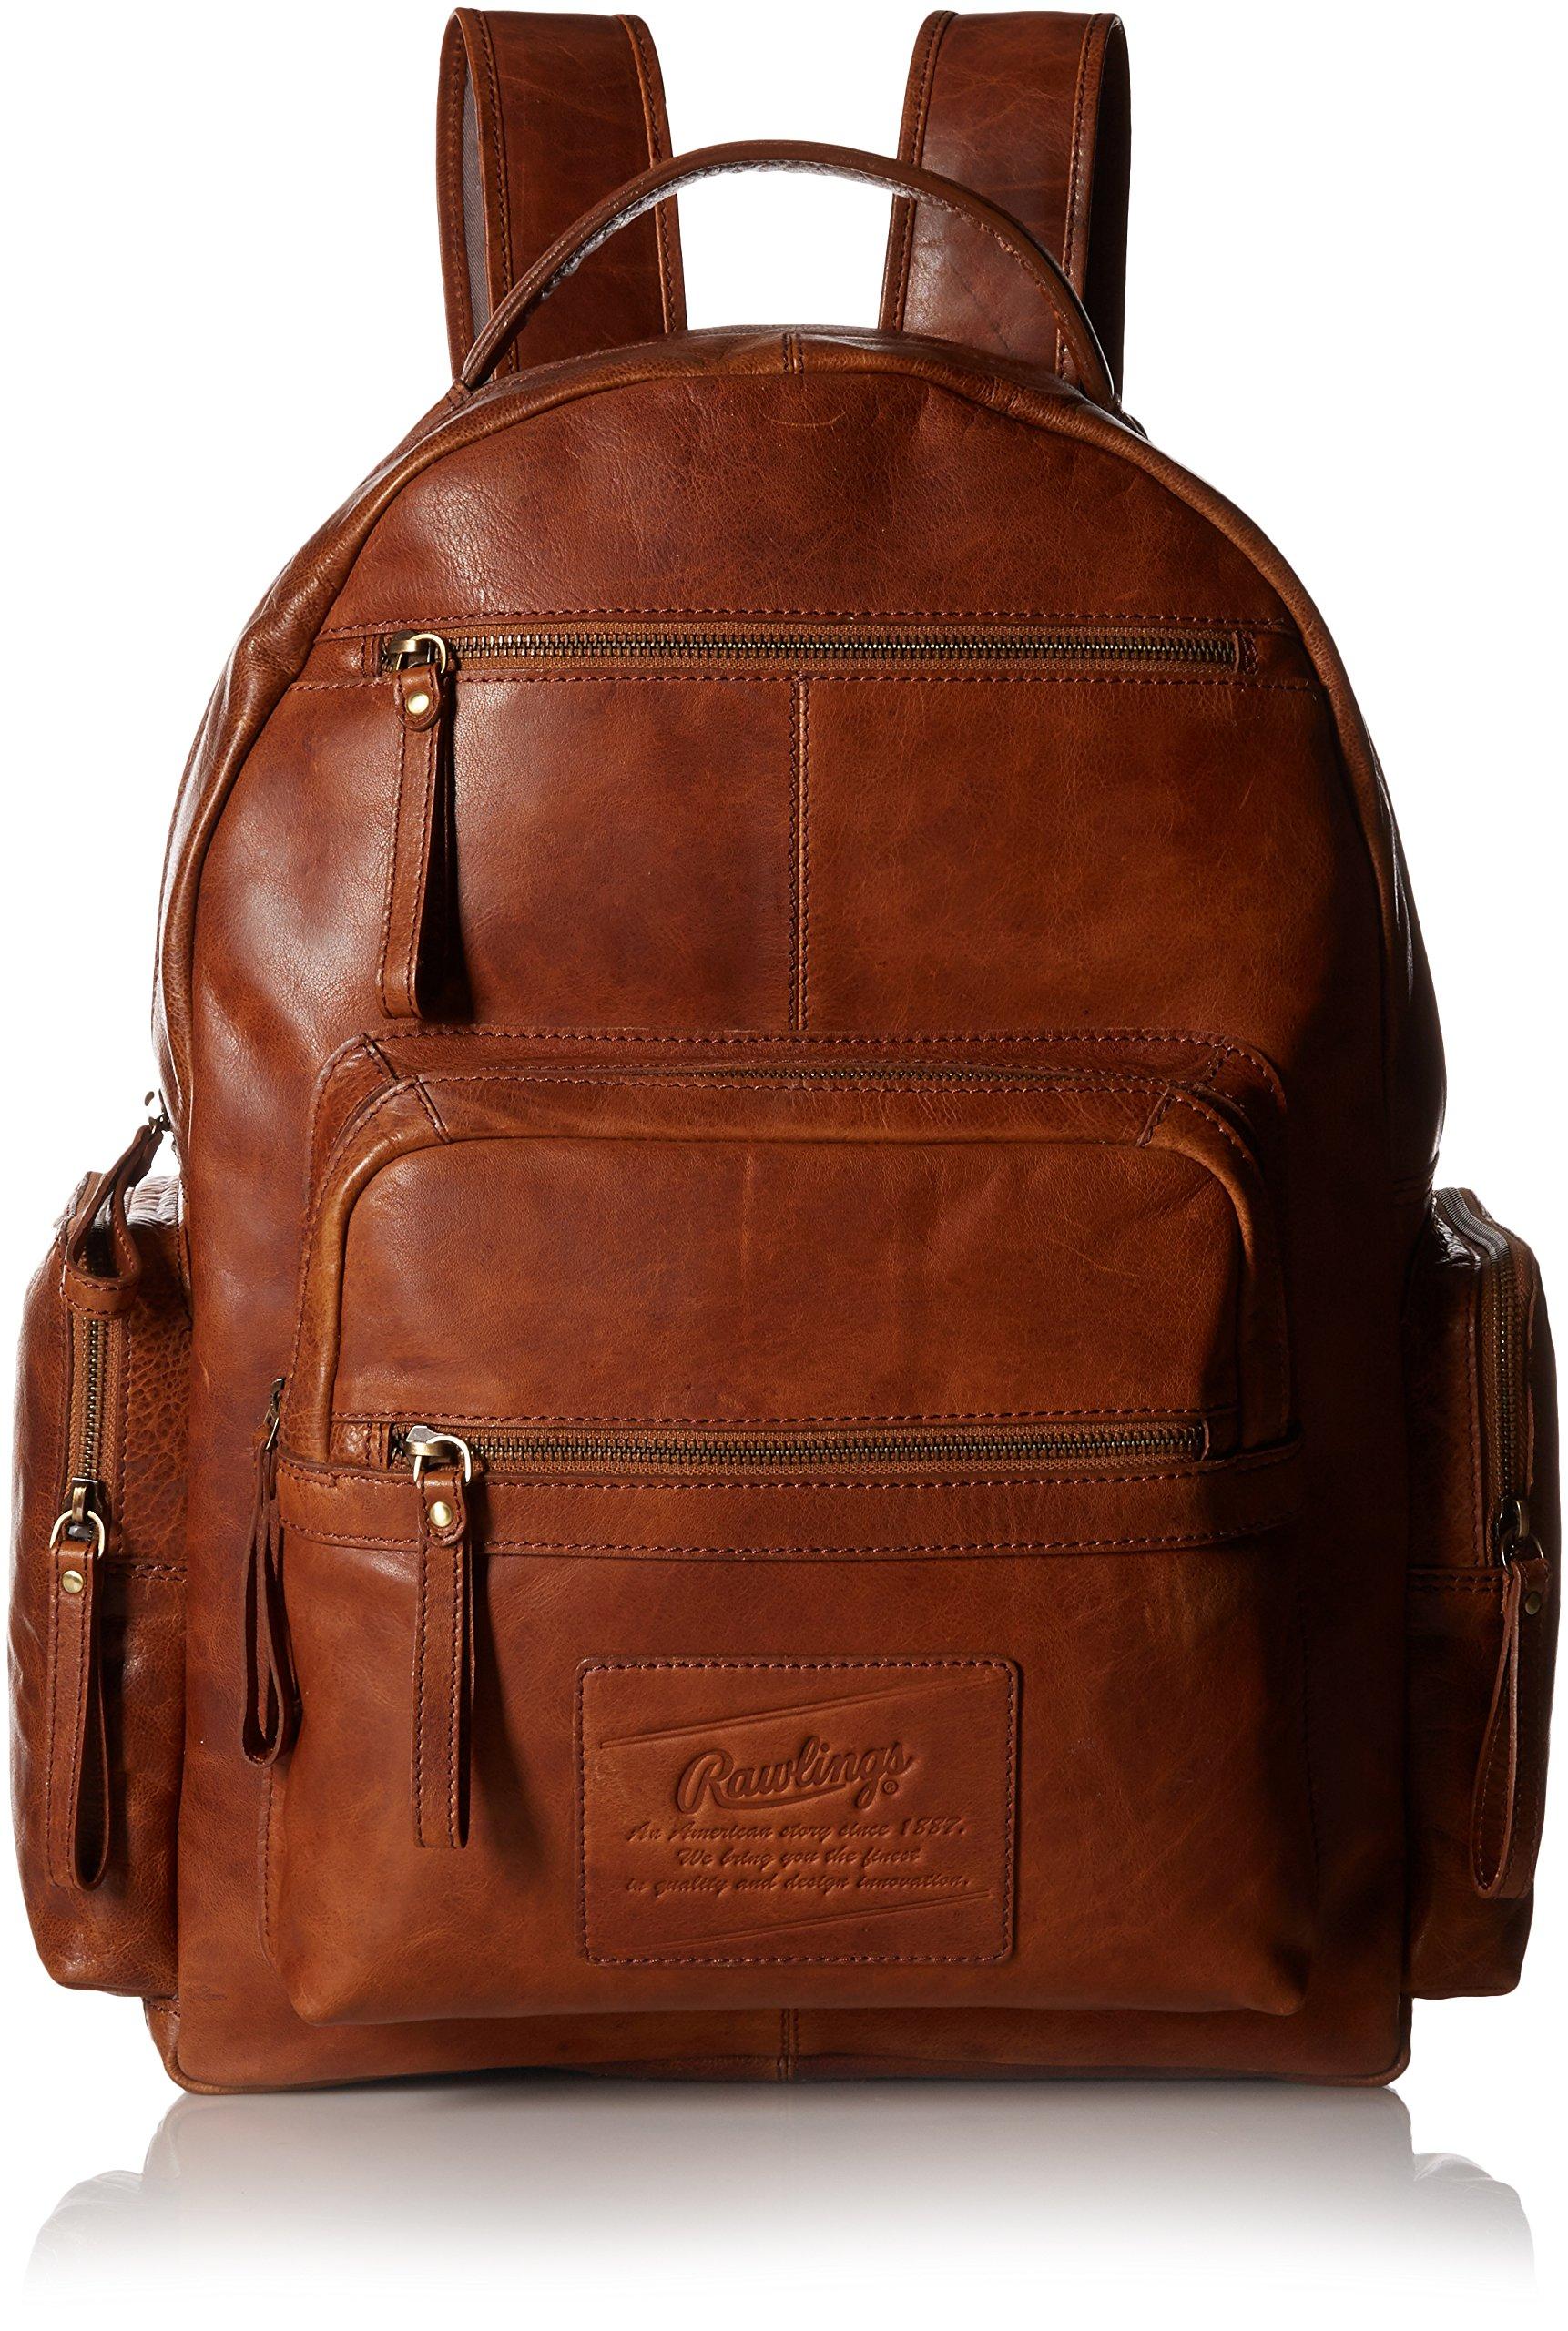 Rawlings Rugged Backpack, Cognac